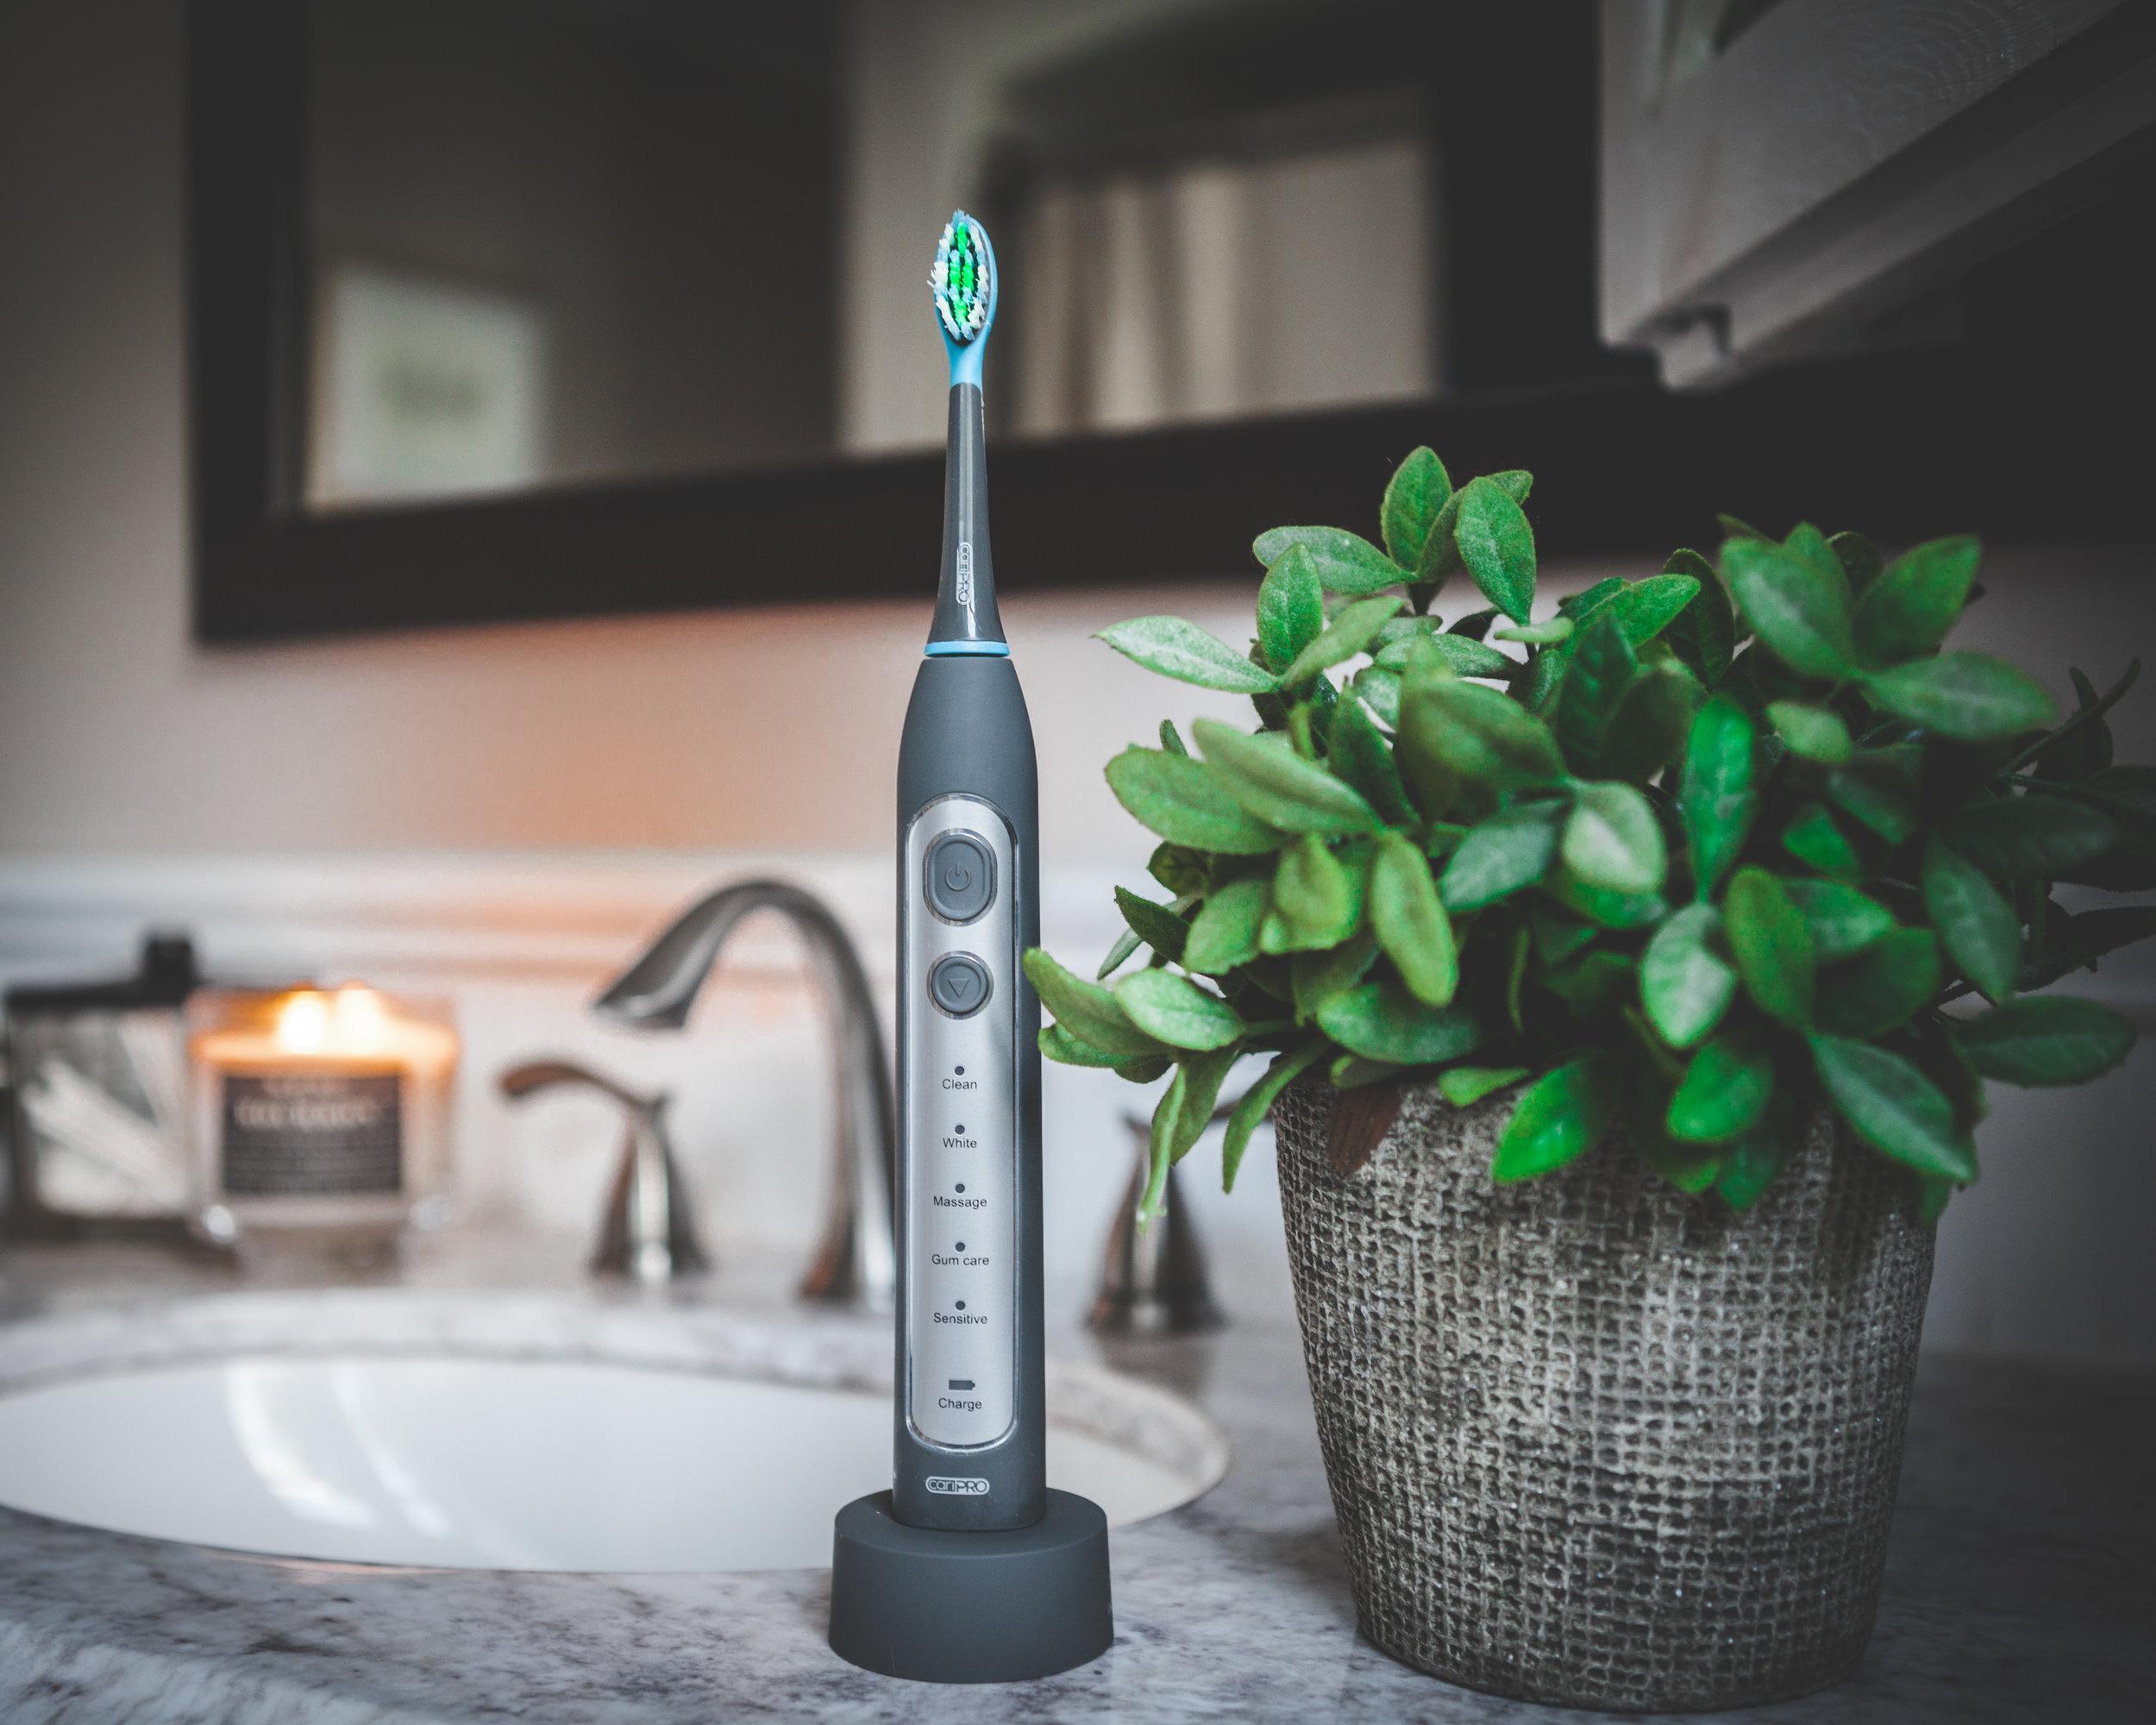 Smile Brilliant CariPRO Toothbrush